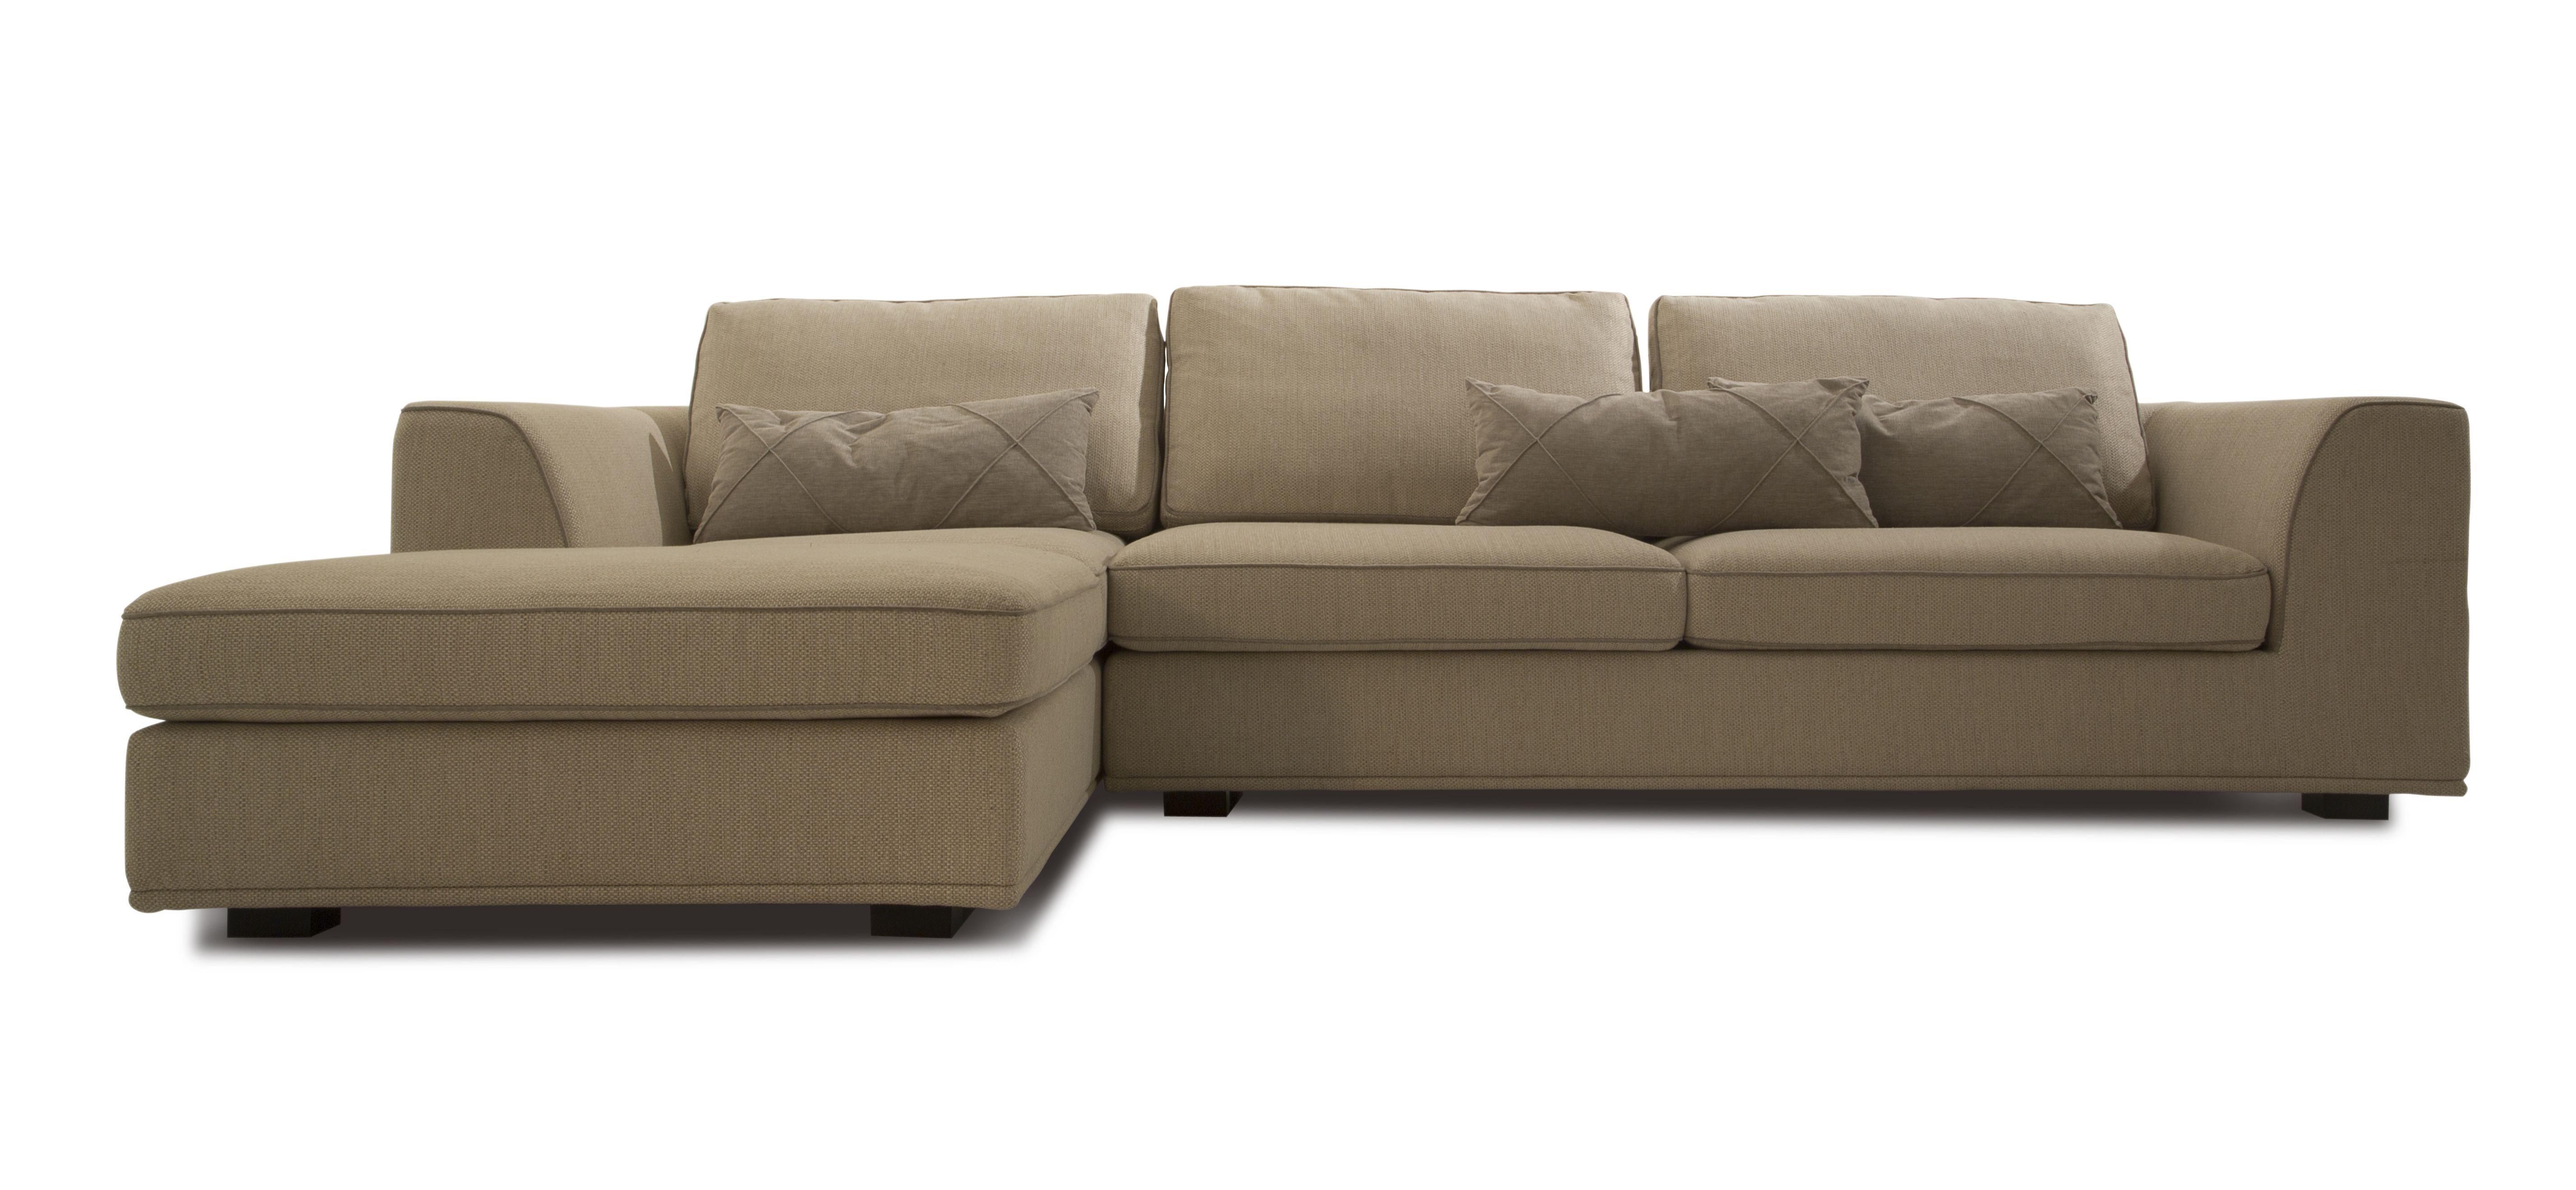 Cocheen Sofa Design Manufacture Modern Sofa Set Sofa Manufacturers Sofa Set